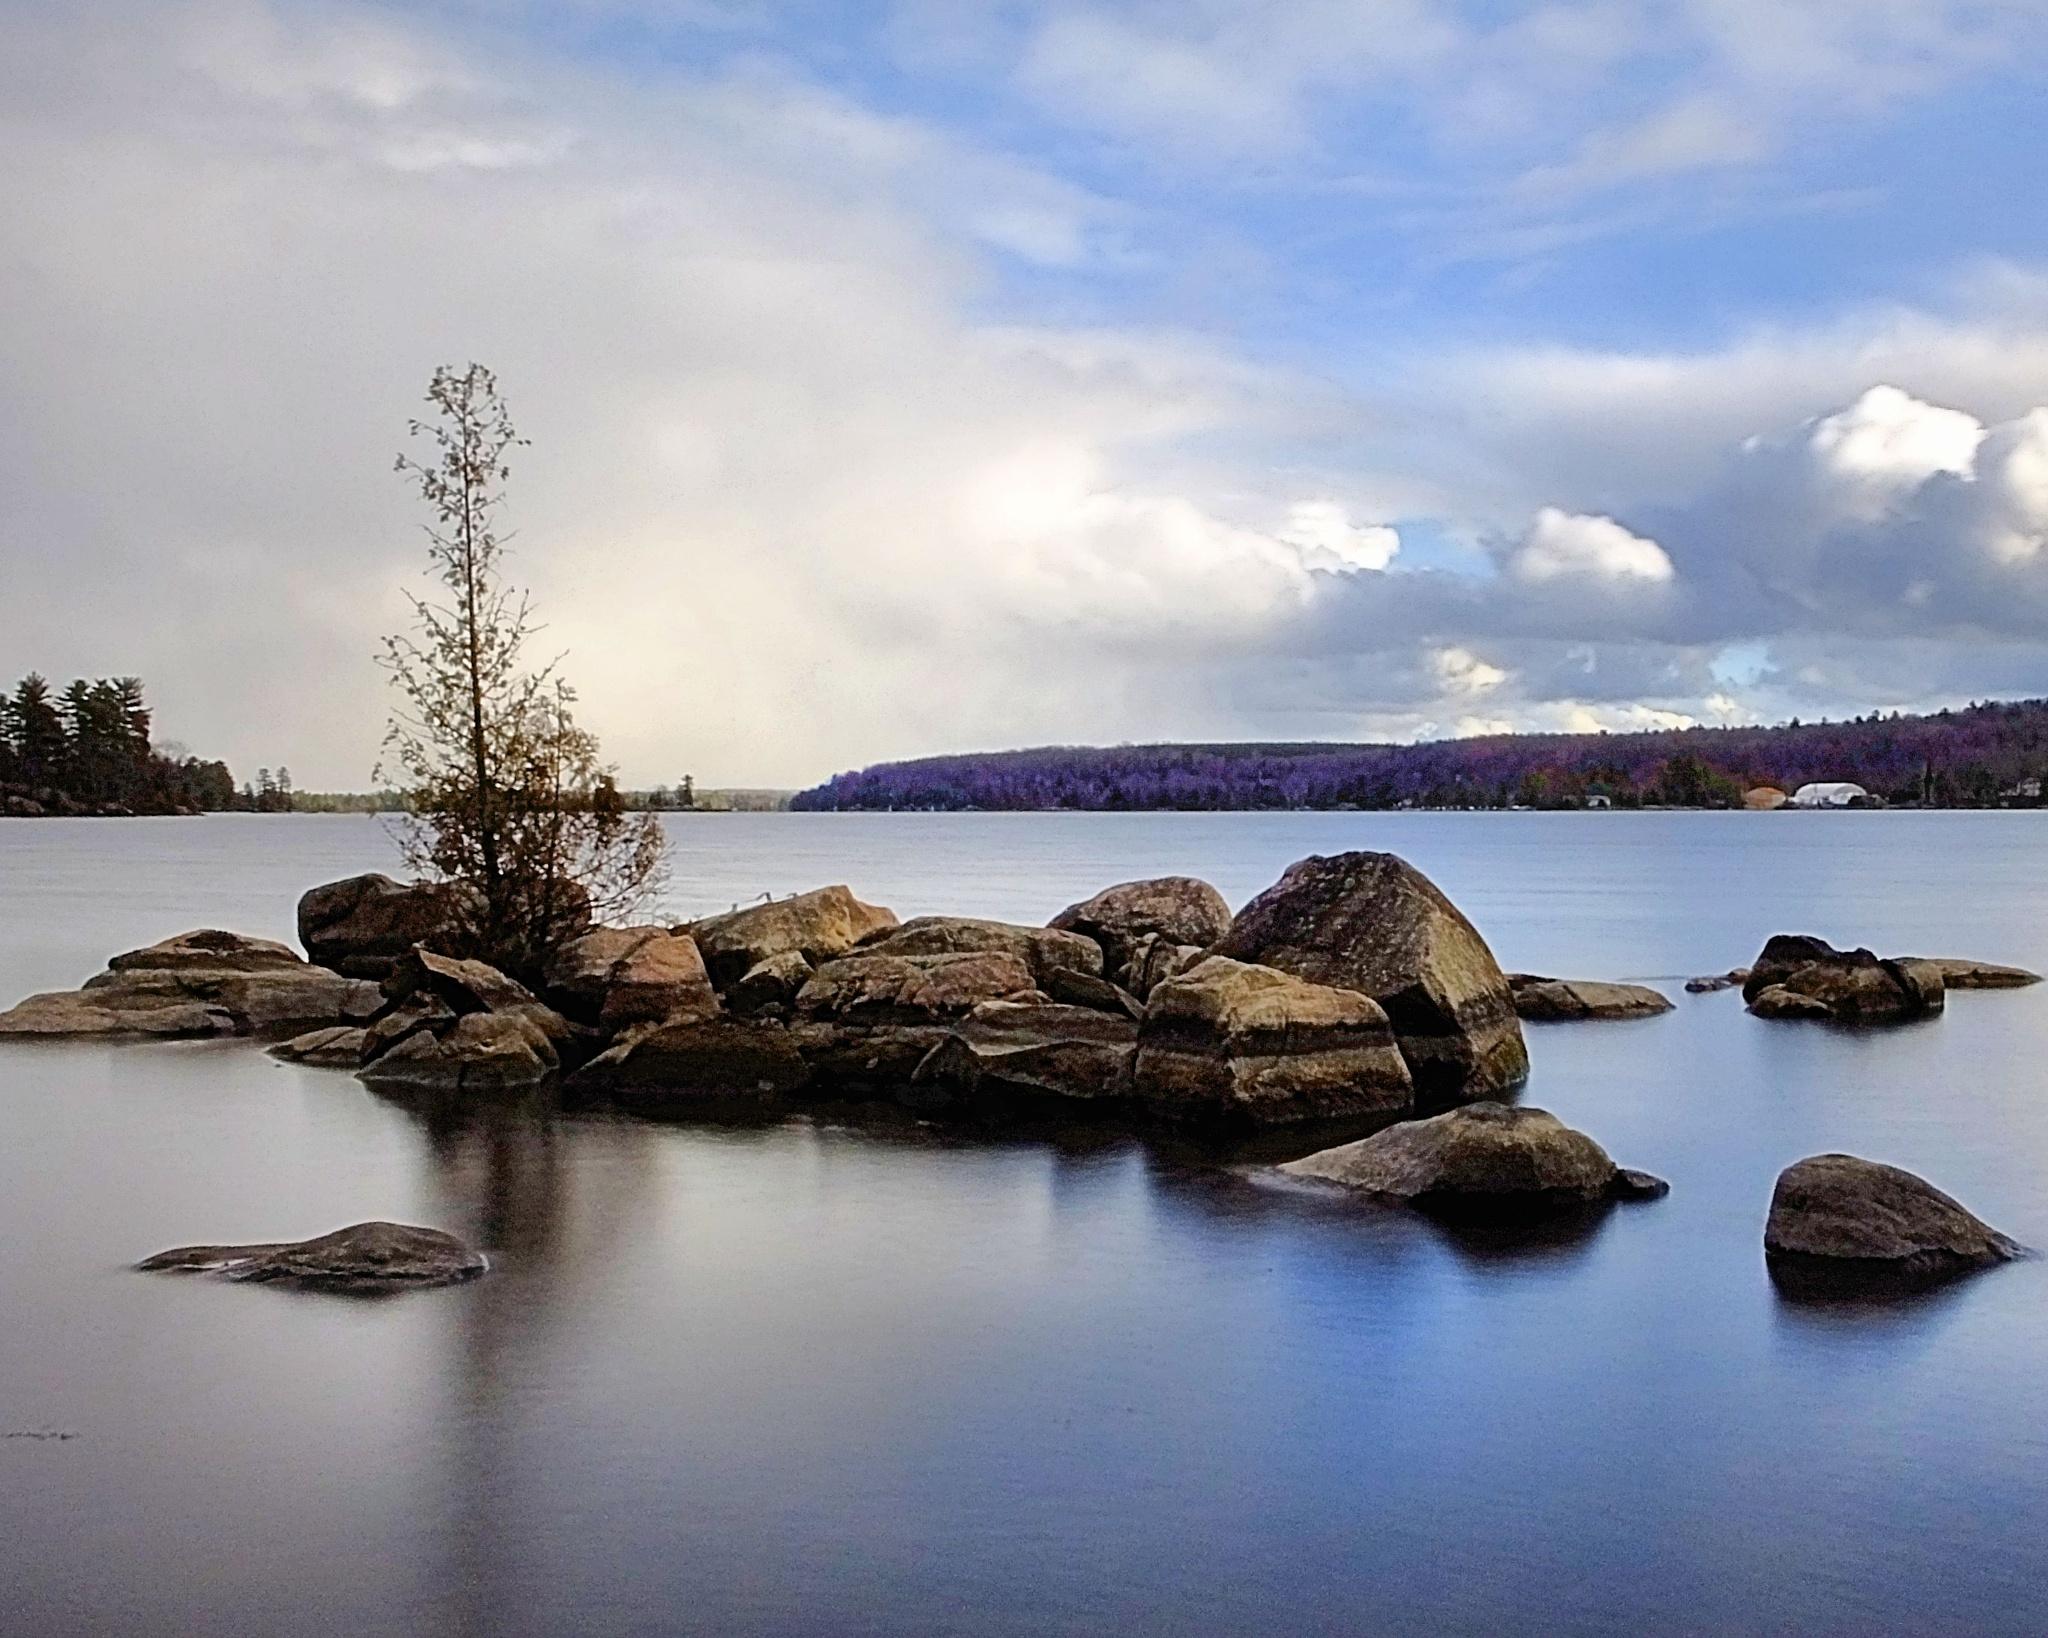 Buckhorn Lake 2 by ptbocarl